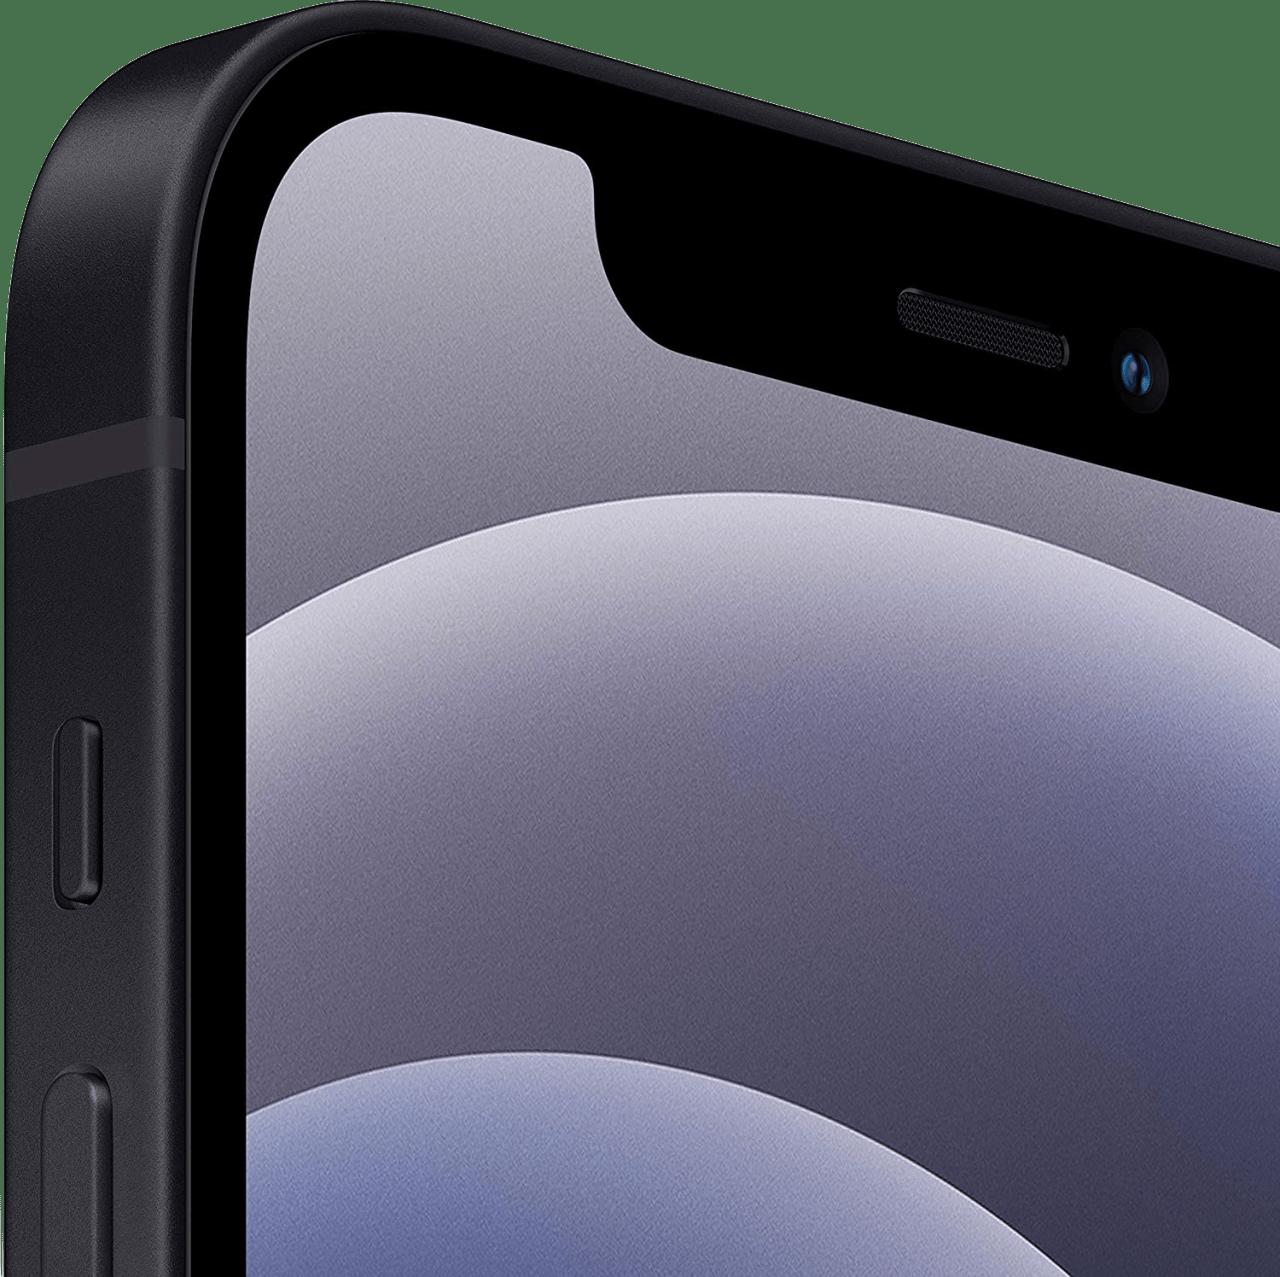 Black Apple iPhone 12 mini 128GB.3